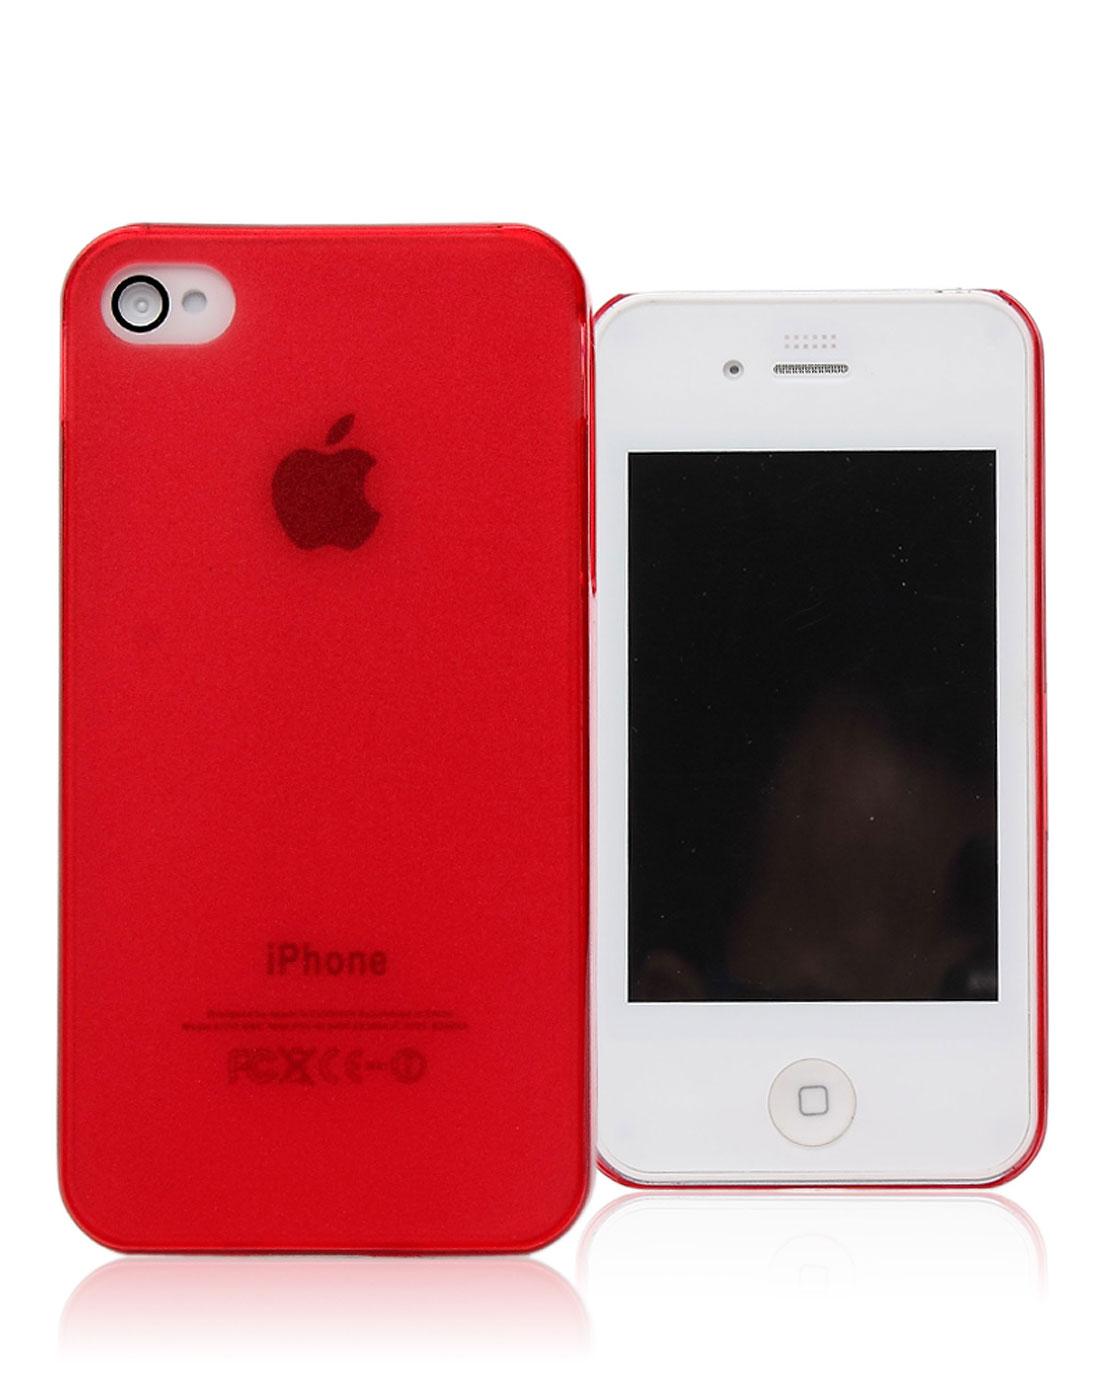 iphone4/4s 红色磨砂透明手机壳